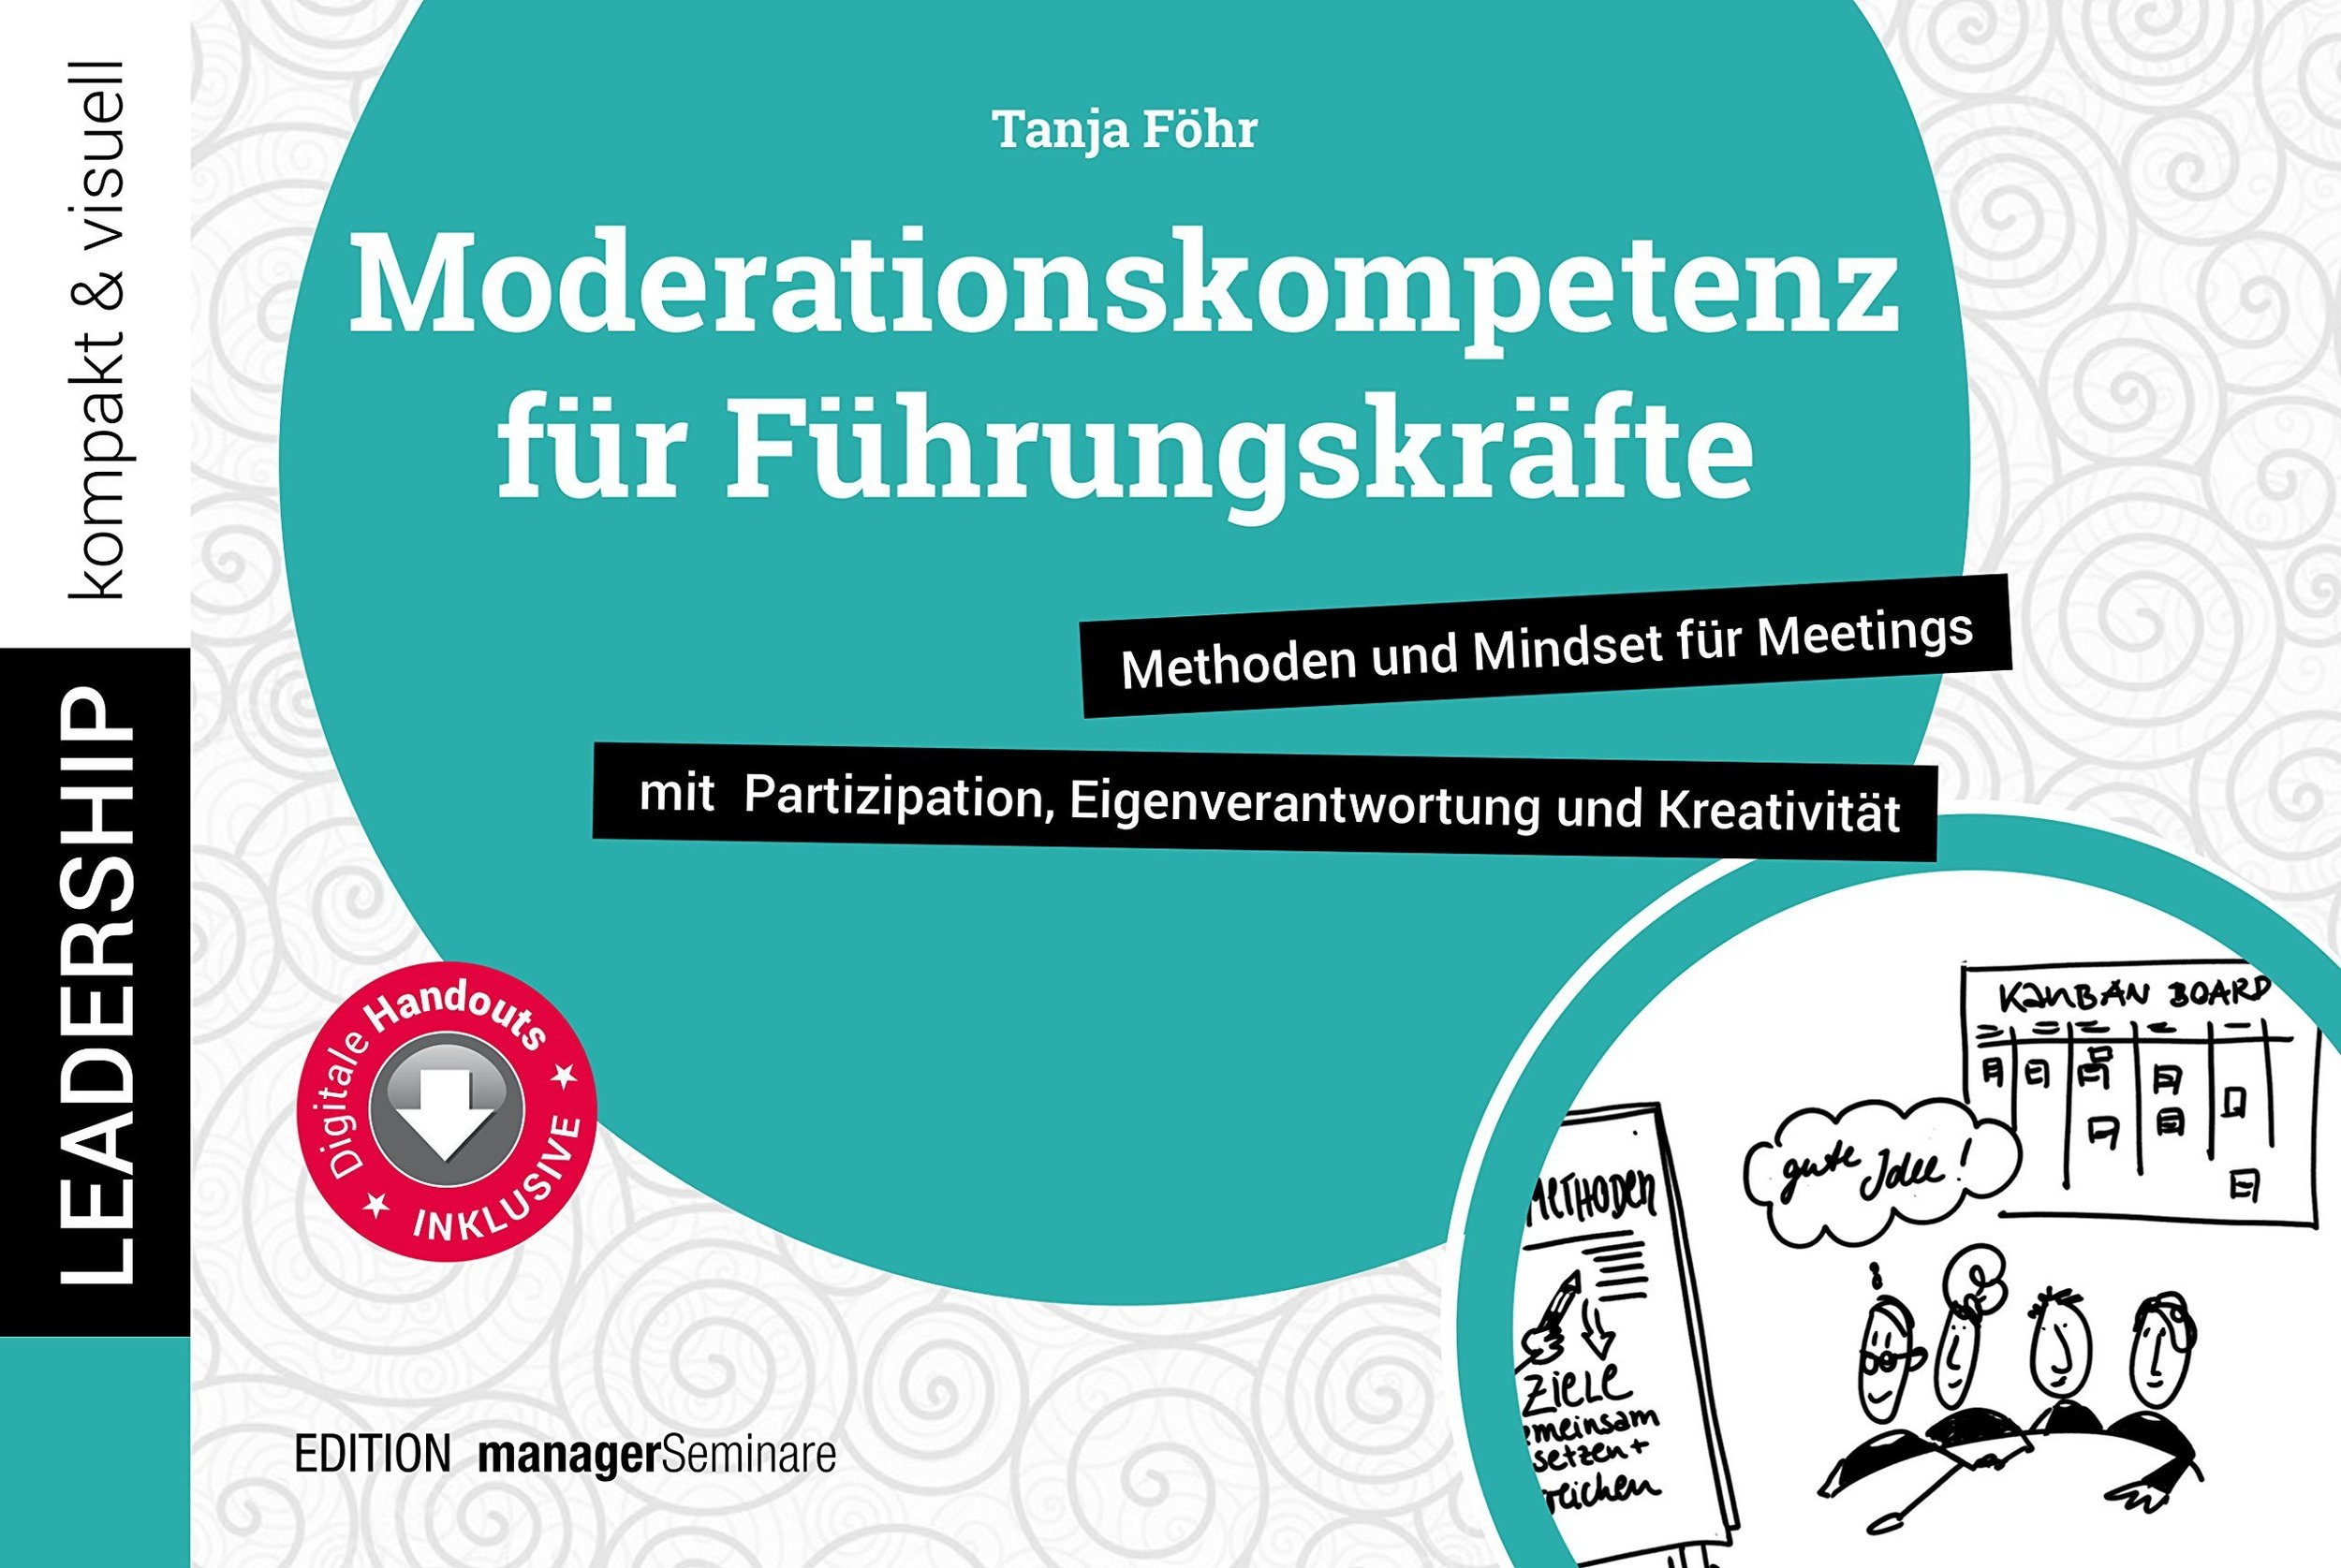 moderationskompetenz.jpg